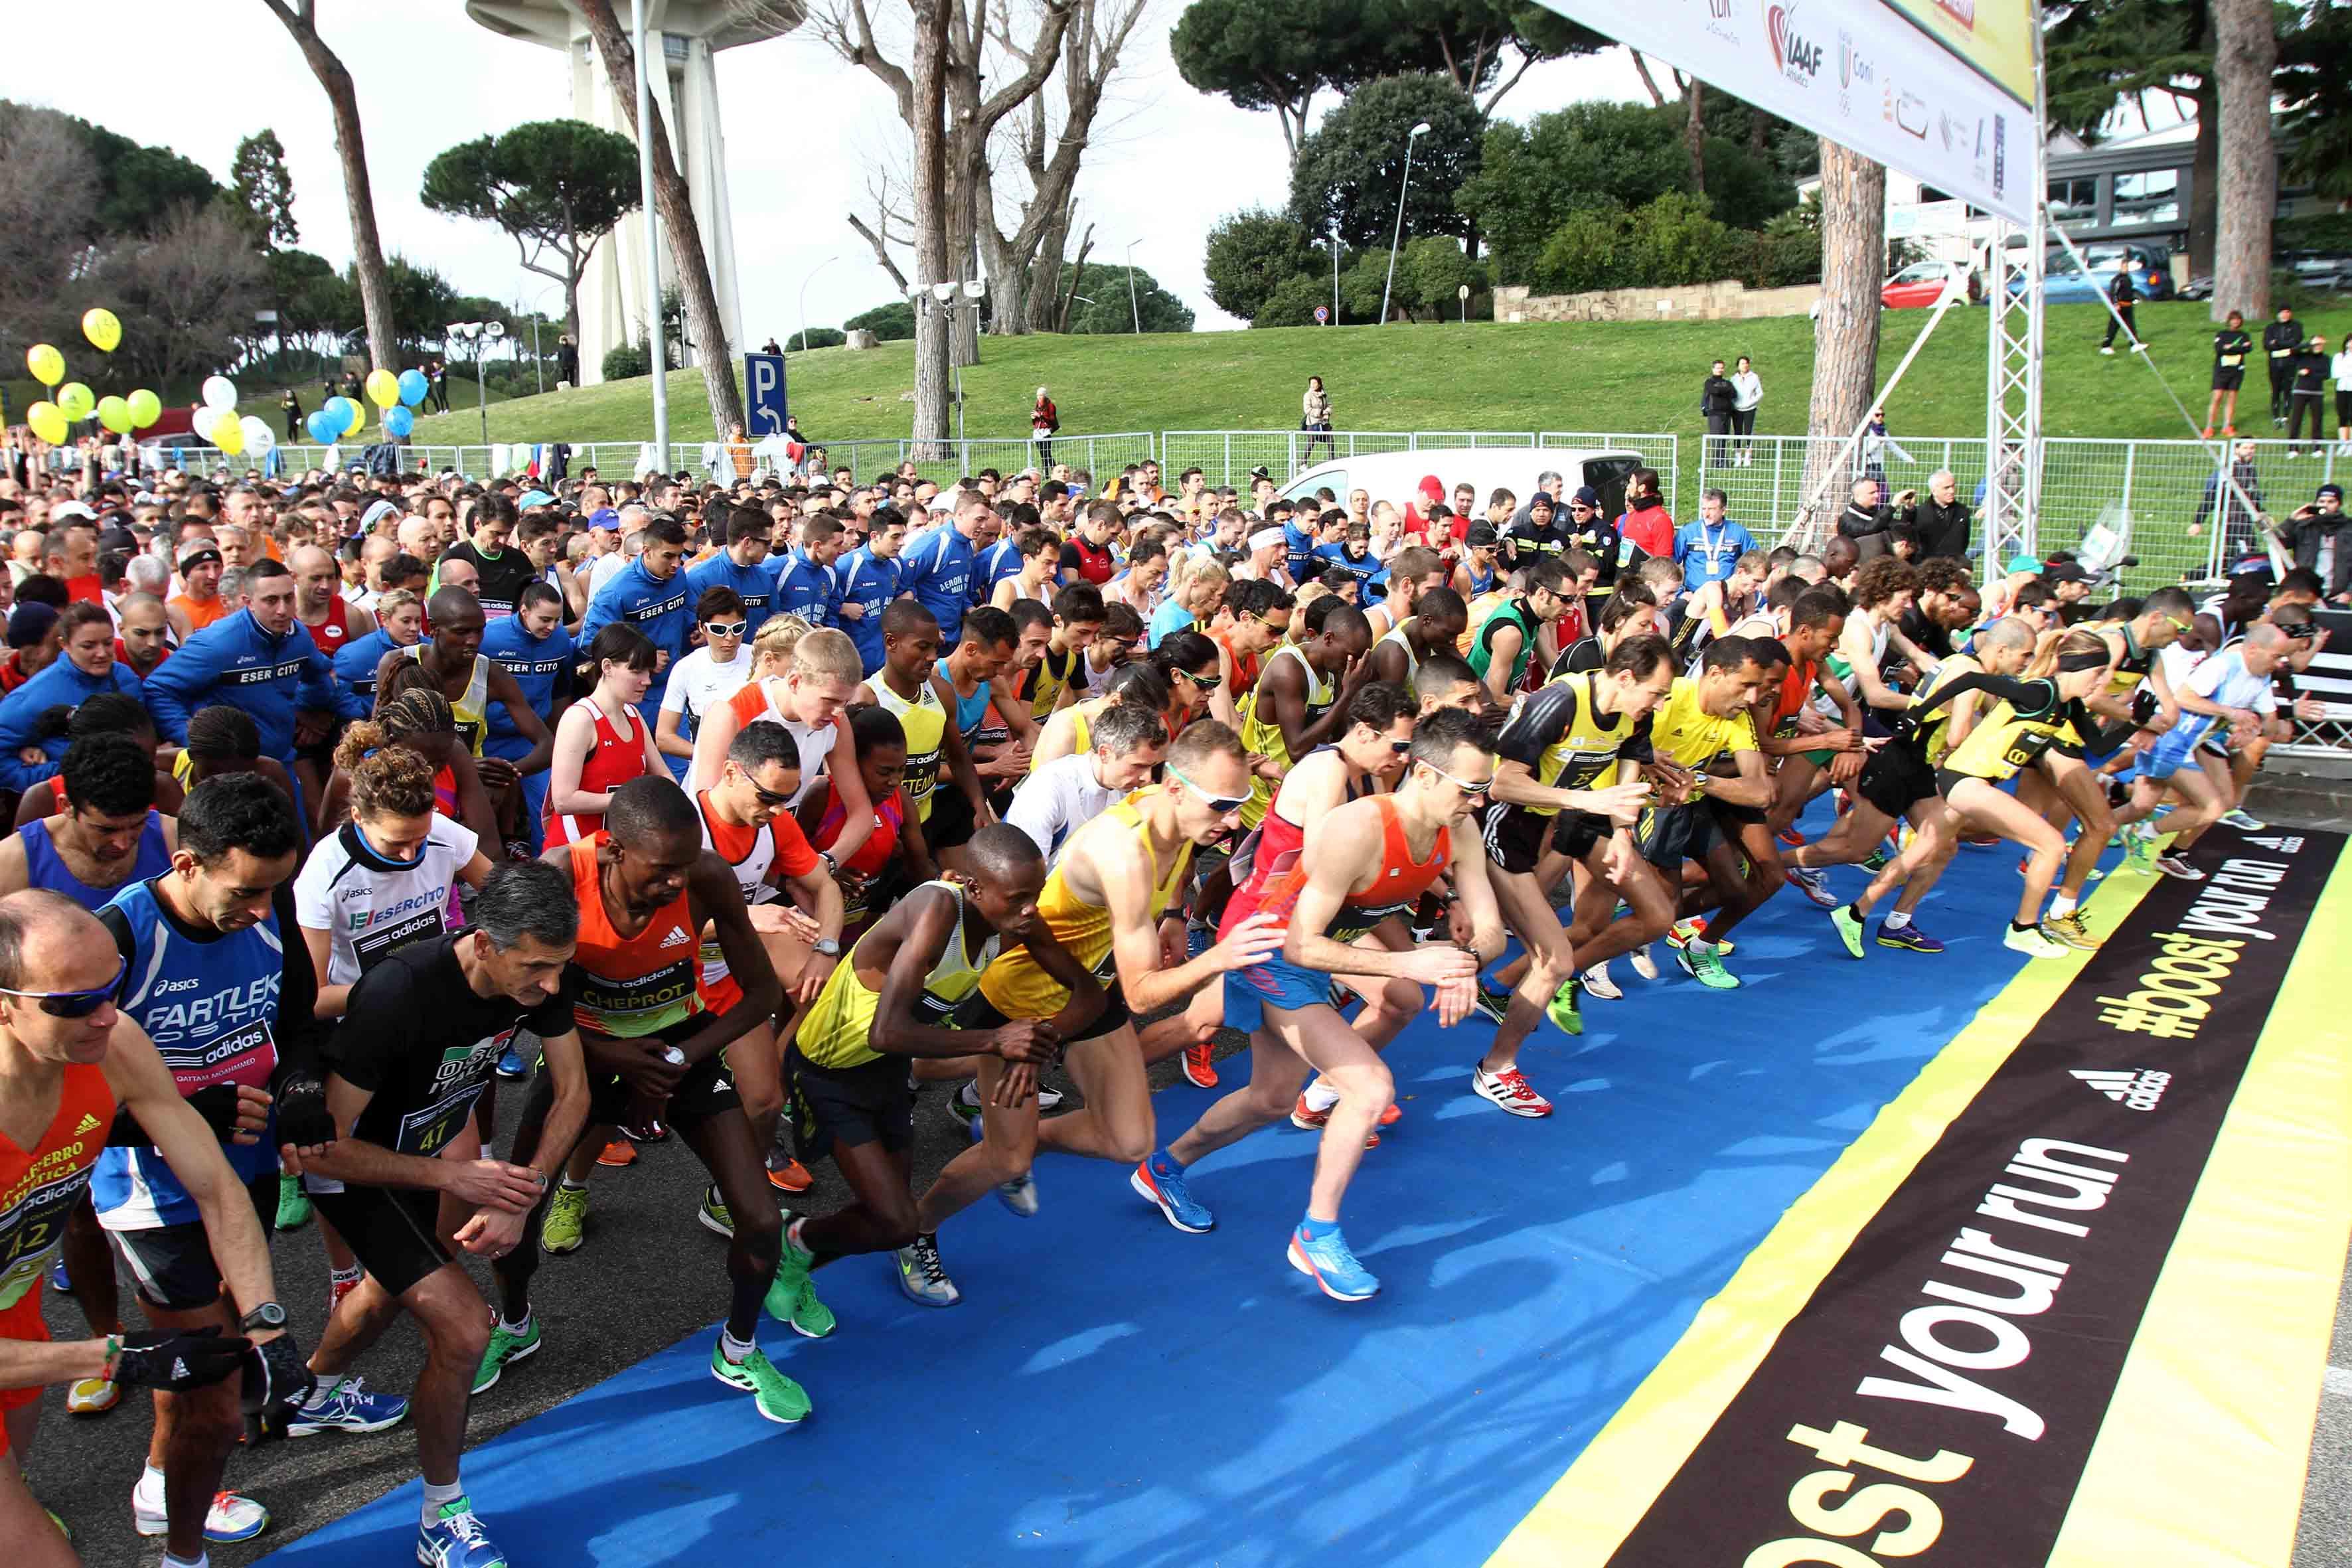 Programma ostia half marathon 2015 for Di tommaso arredamenti ostia